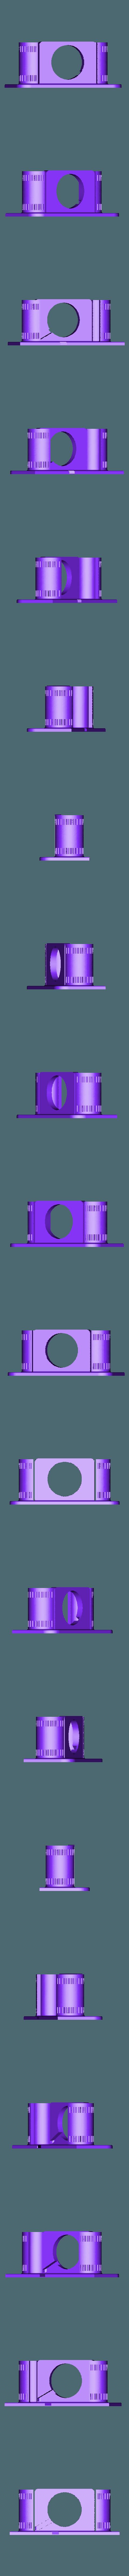 watchBNF.stl Download free STL file Apple Watch alarm stand • 3D print model, Obenottr3D